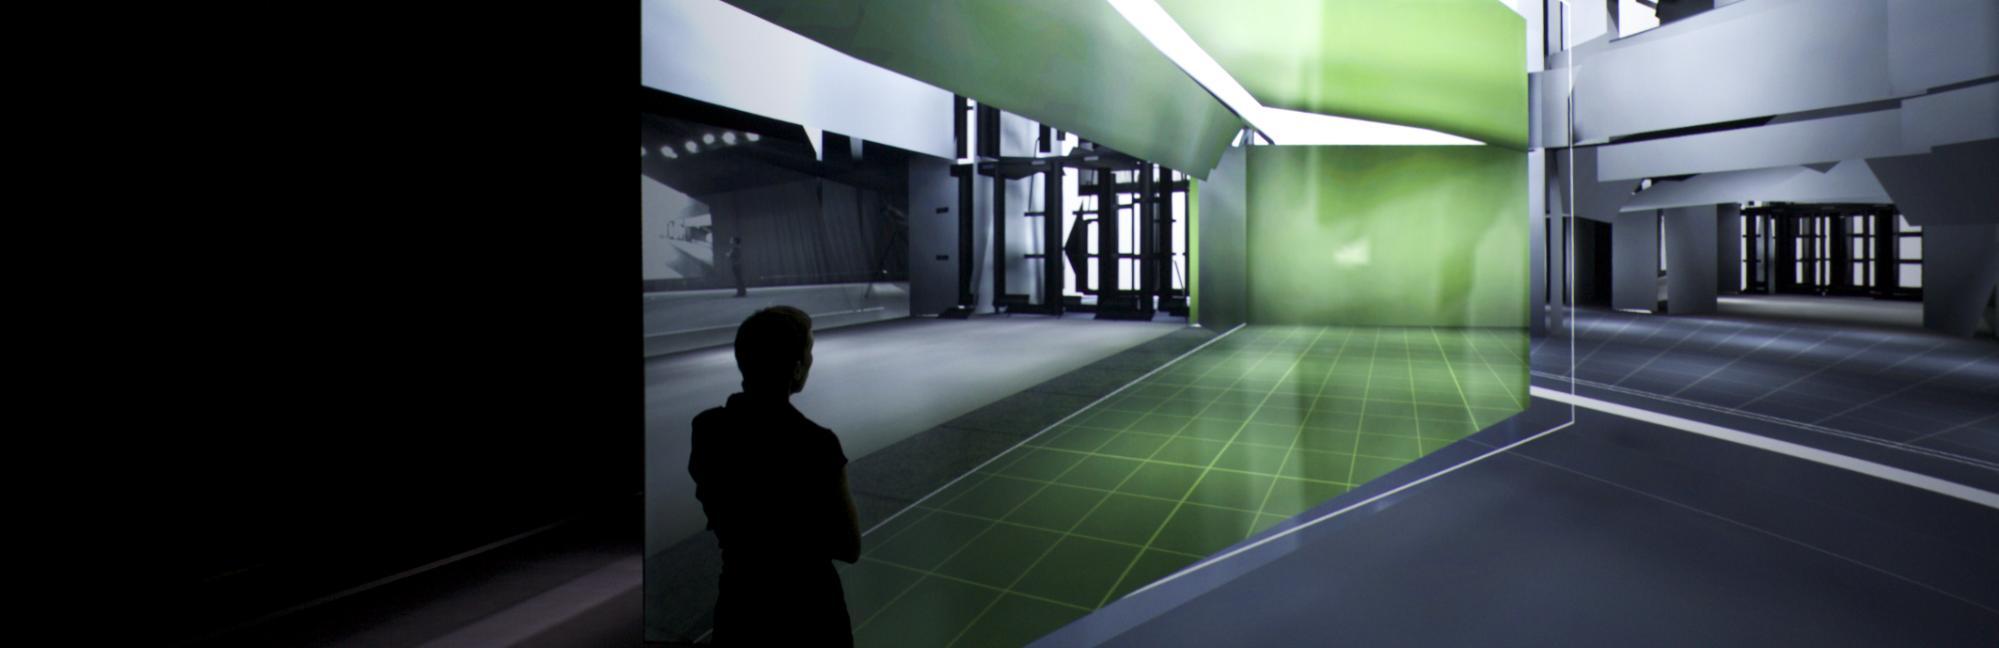 (Realtime Unreal - Musée d'art contemporain de Montréalでのインスタレーション, 2011.